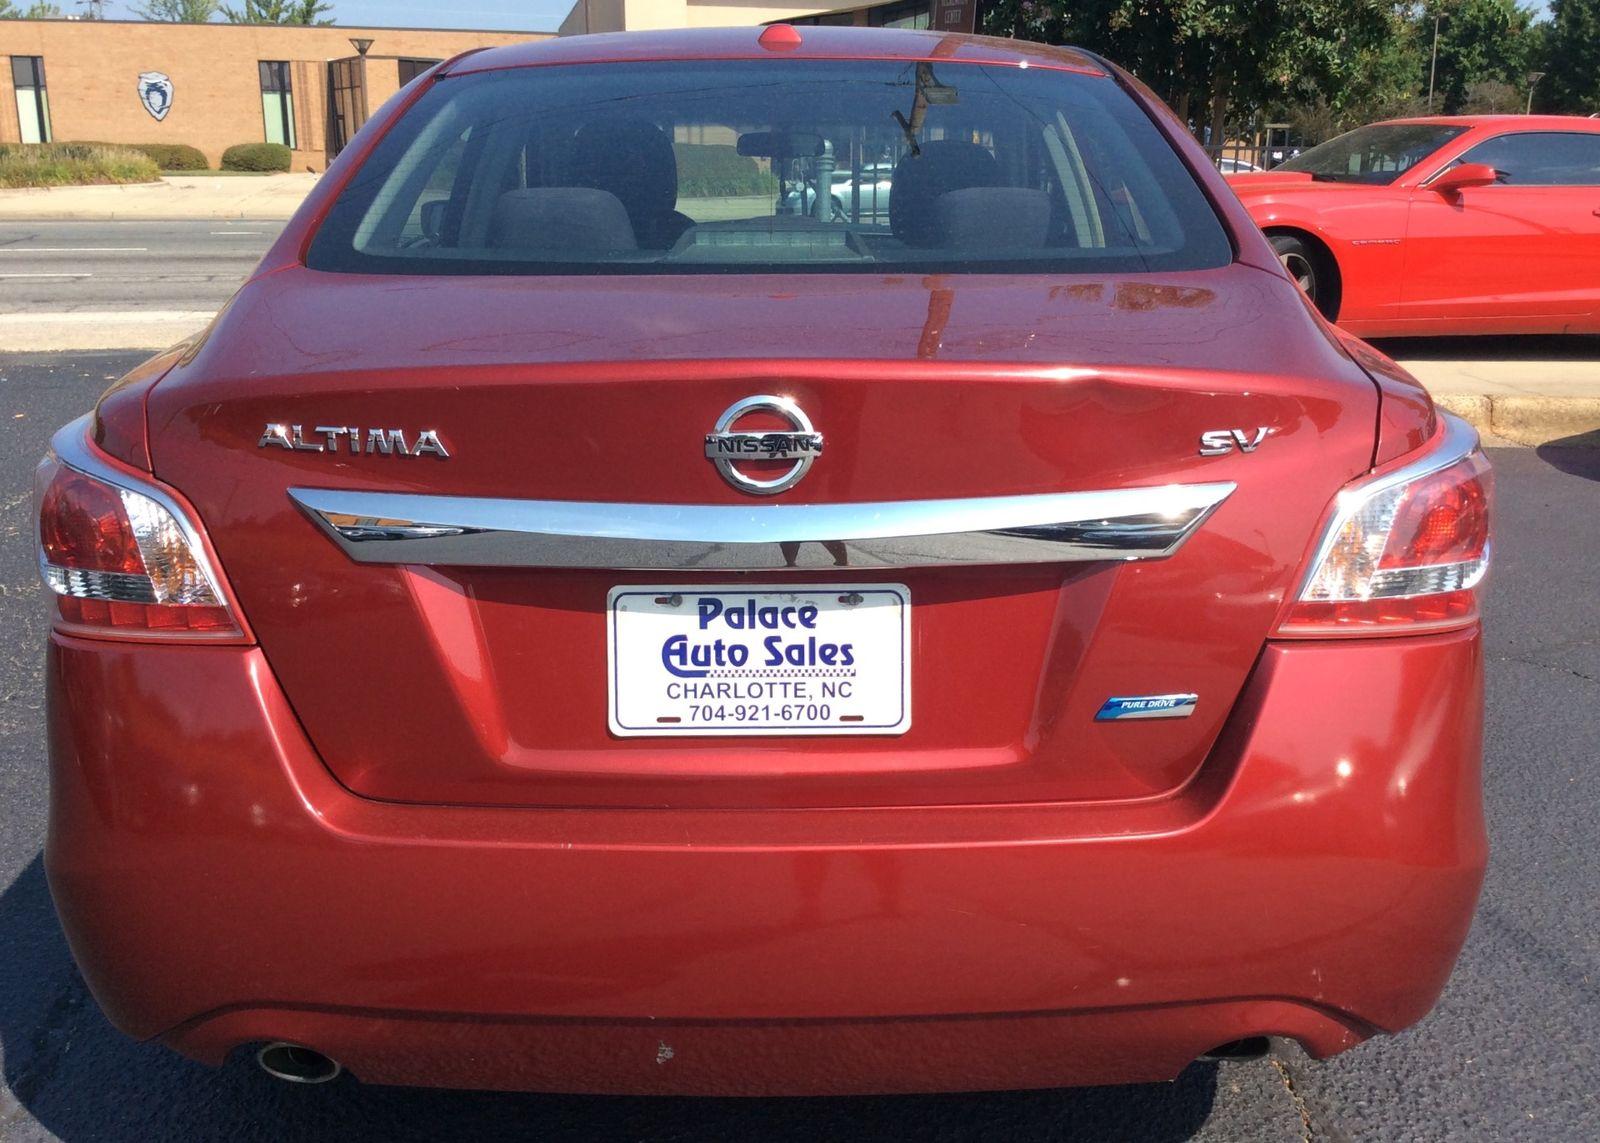 carolina north city charlotte revo gt nissan nc palace in r sales auto premium